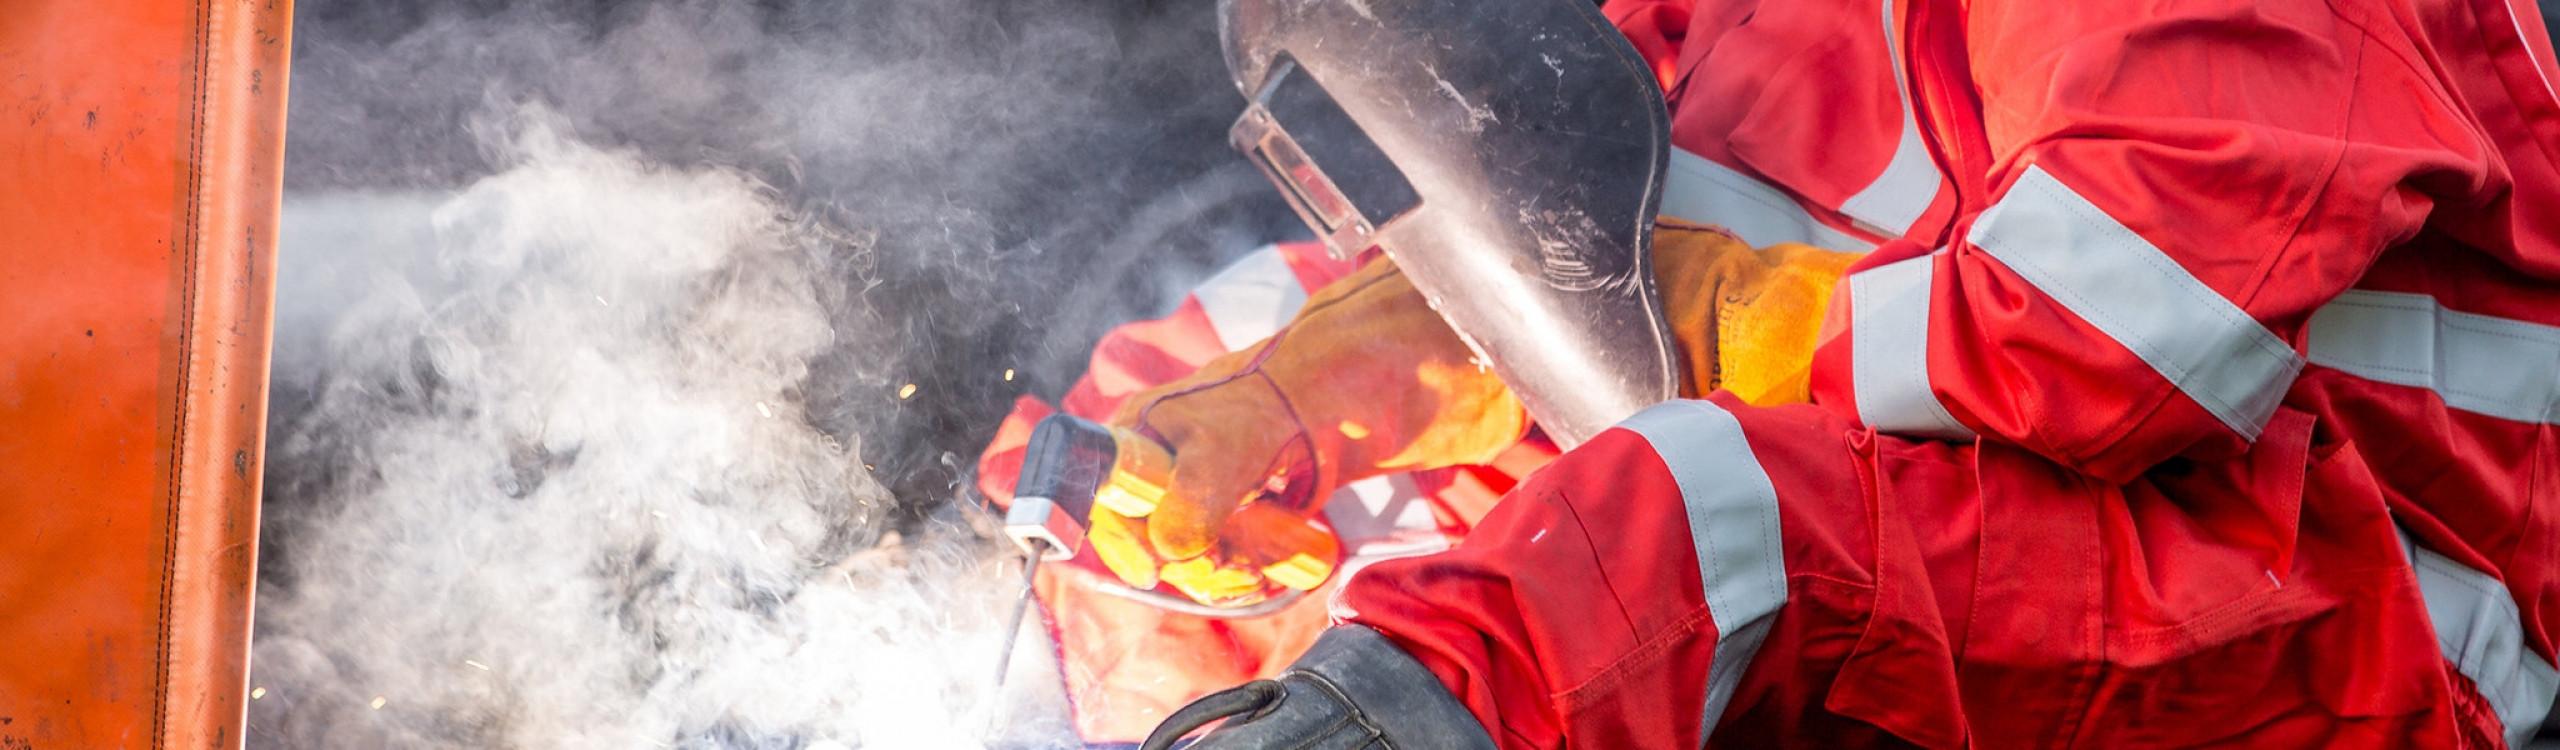 We always deliver a job weld done